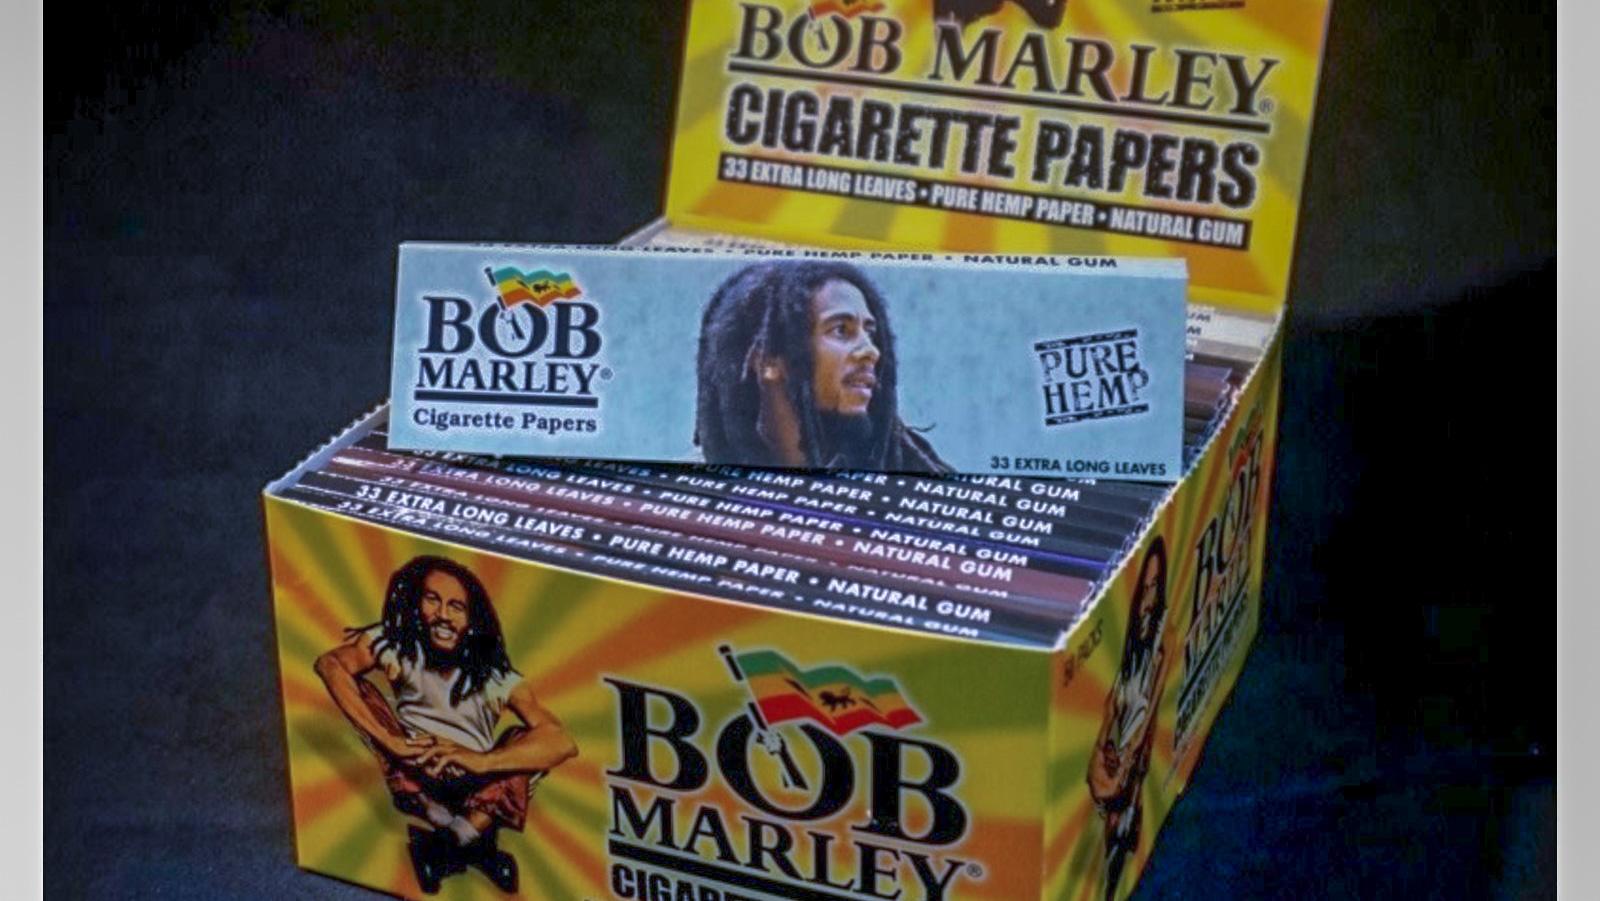 Bob Marley Cigarette Papers KS